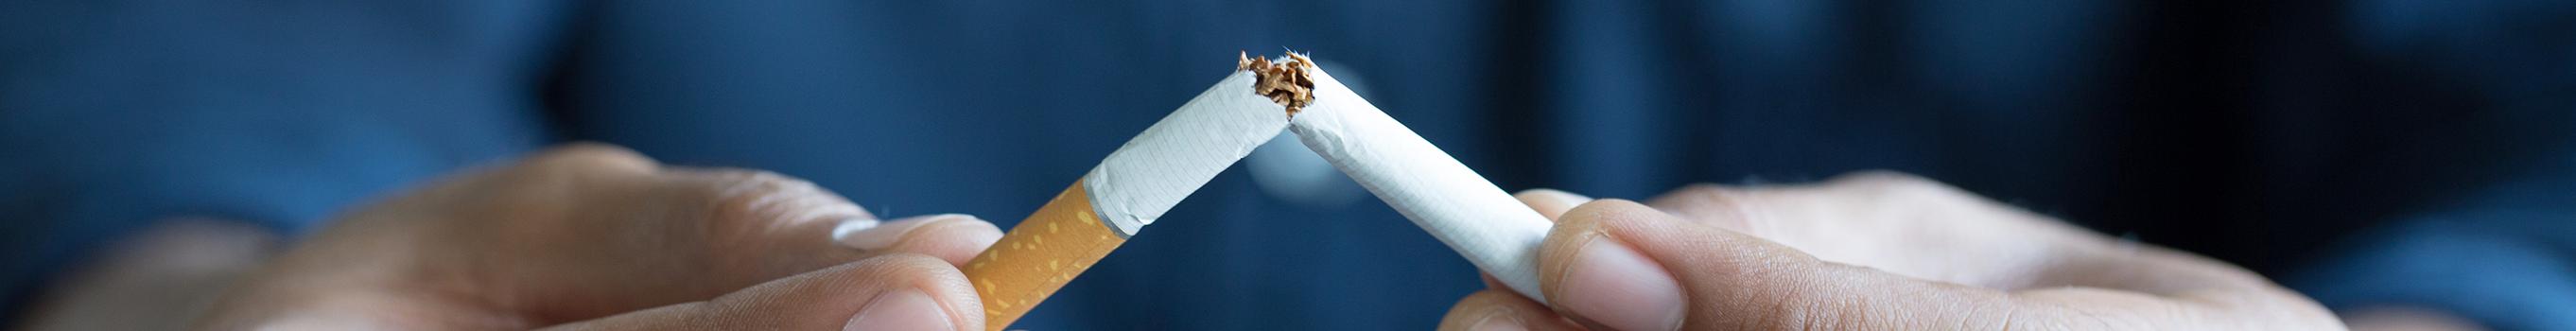 Her er vi sammen om en røgfri fremtid